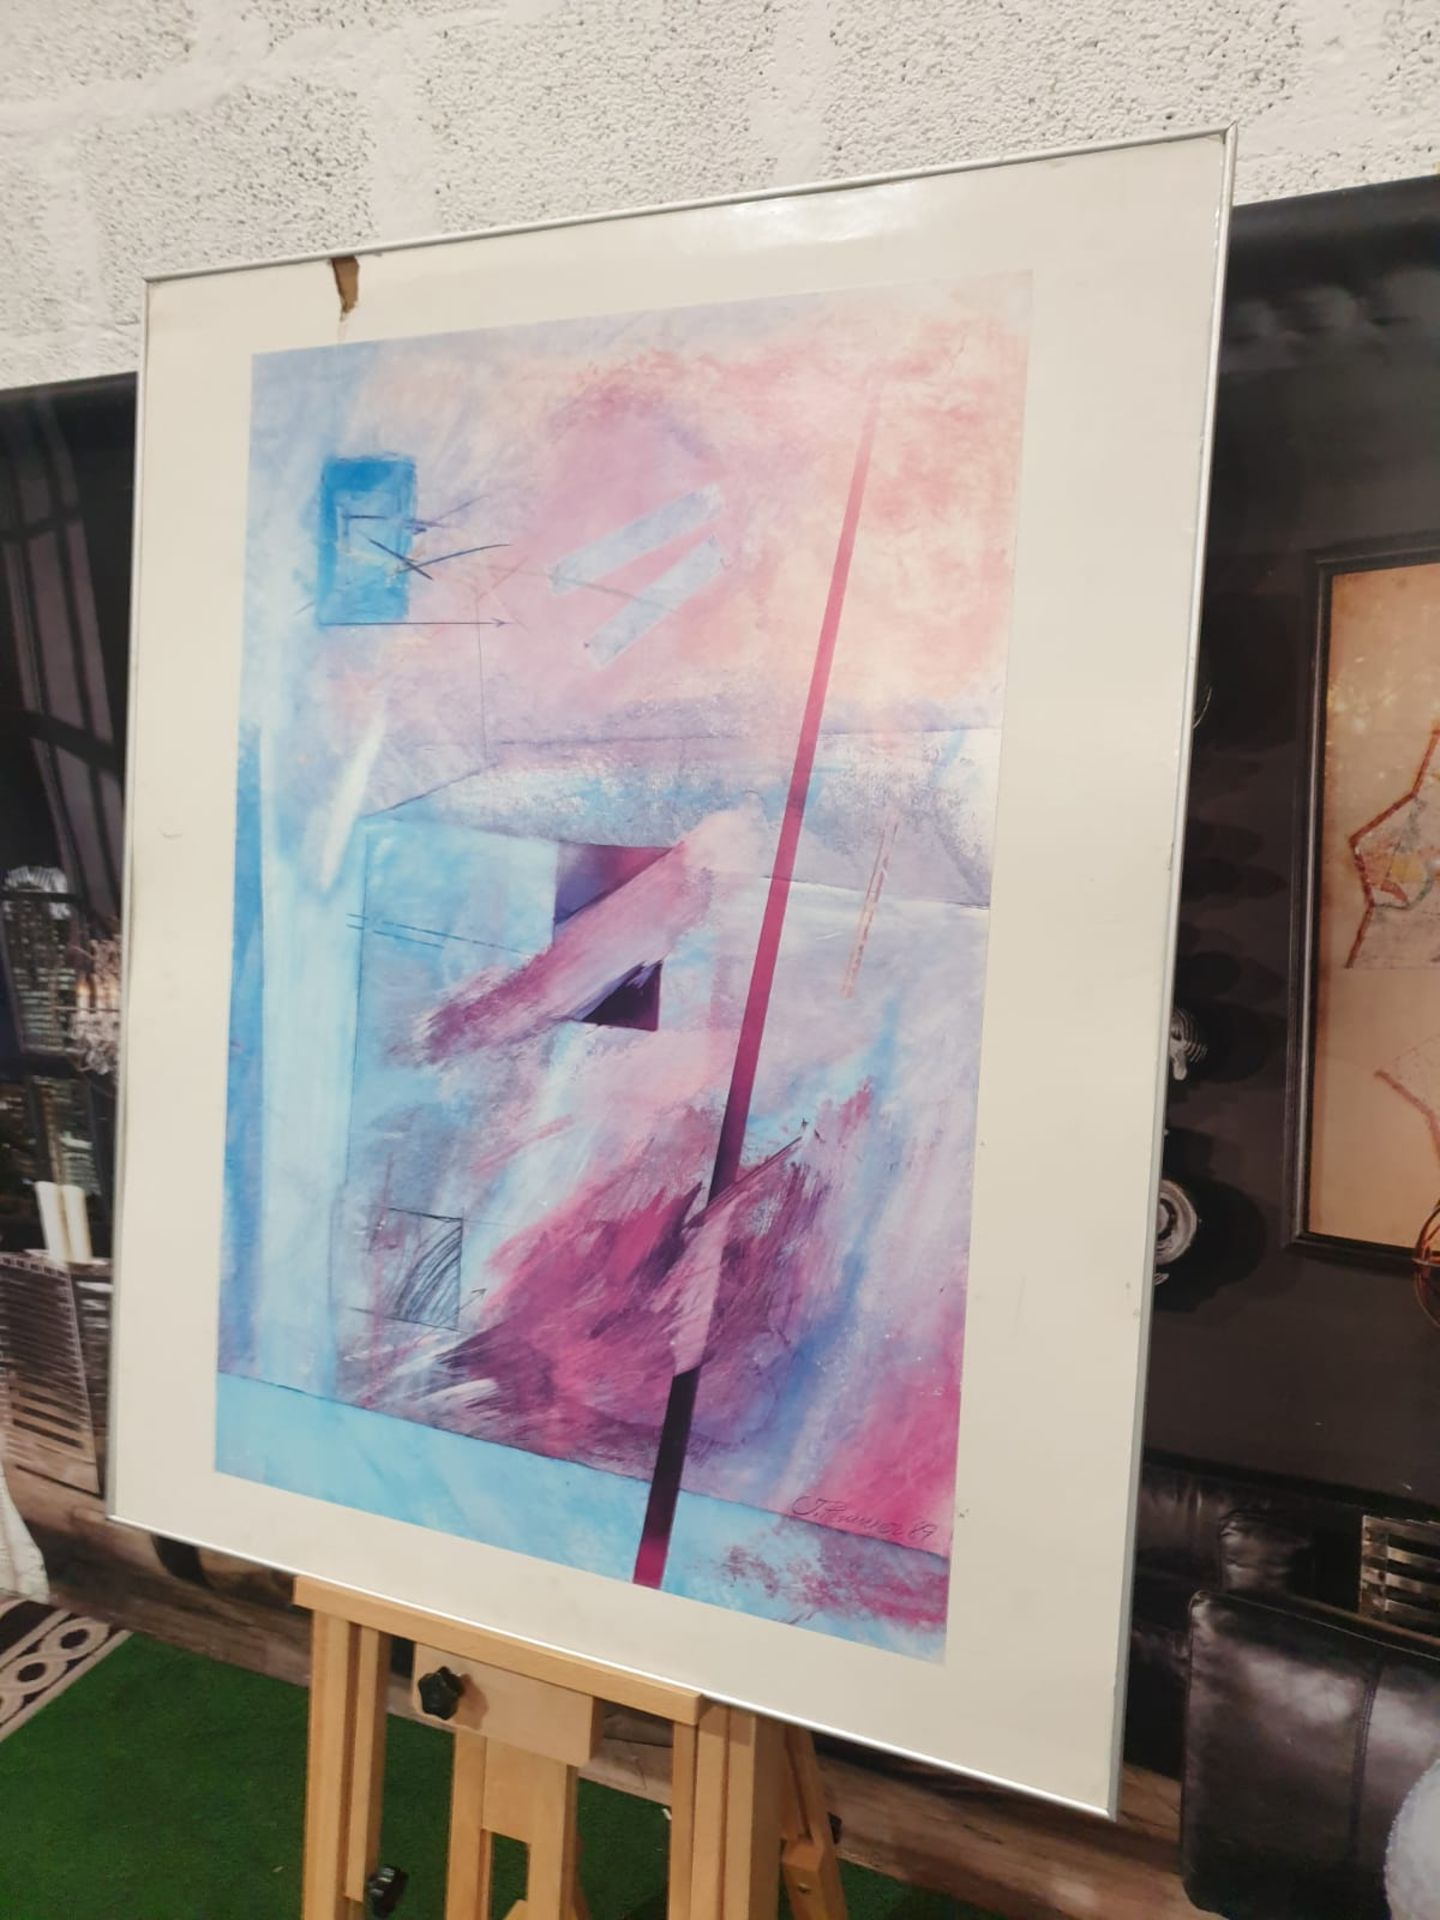 Abstract Blue/Purple wall art J. Hermasuez 89 91 x 111cm